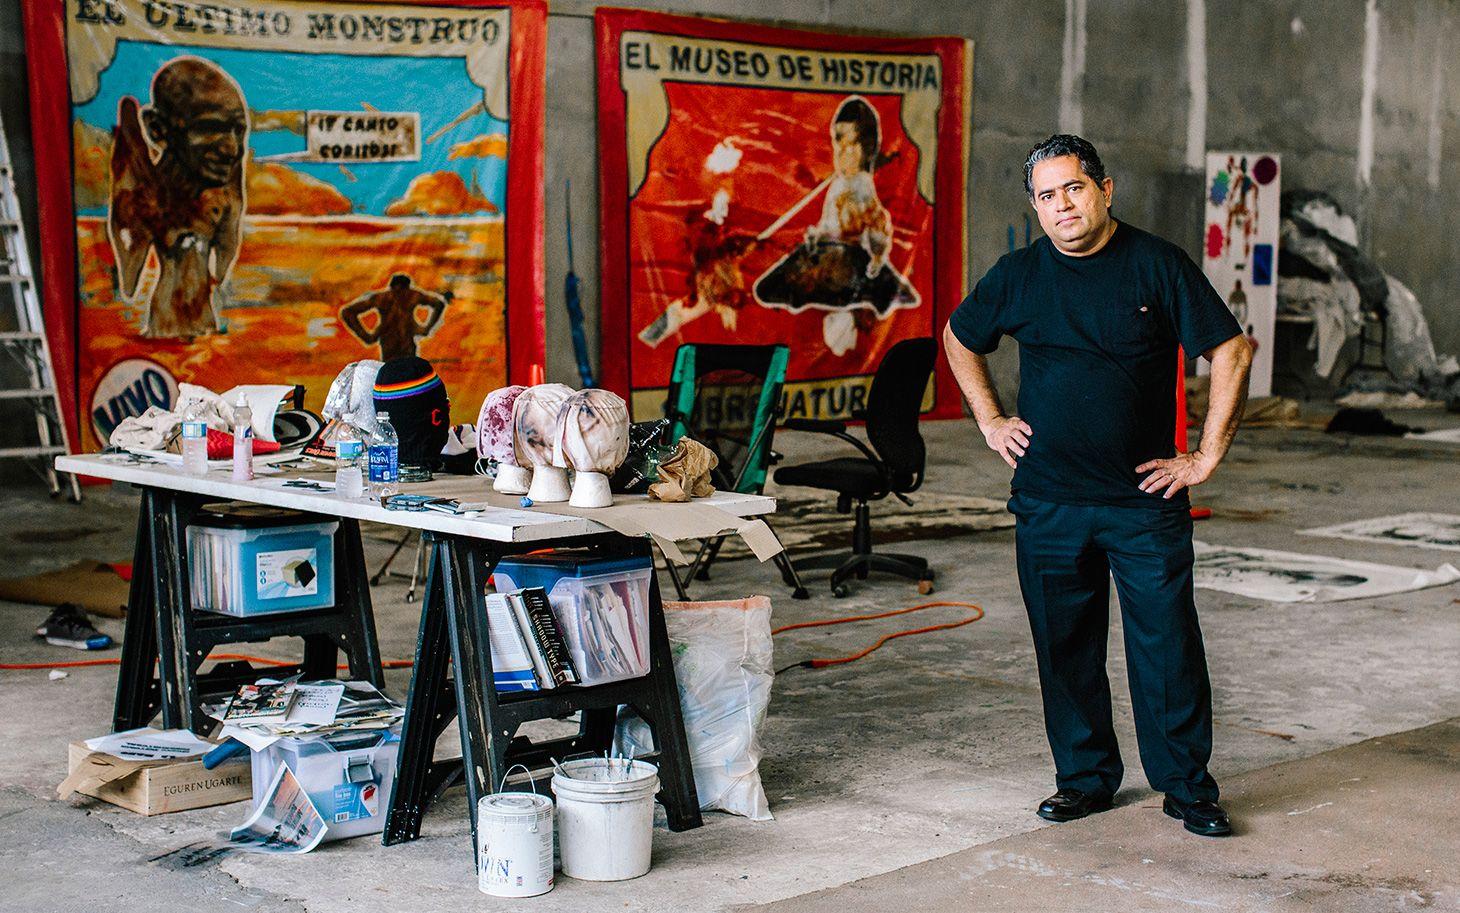 Artists how to stay in Puerto Rico despite Crisis, Al Jazeera America